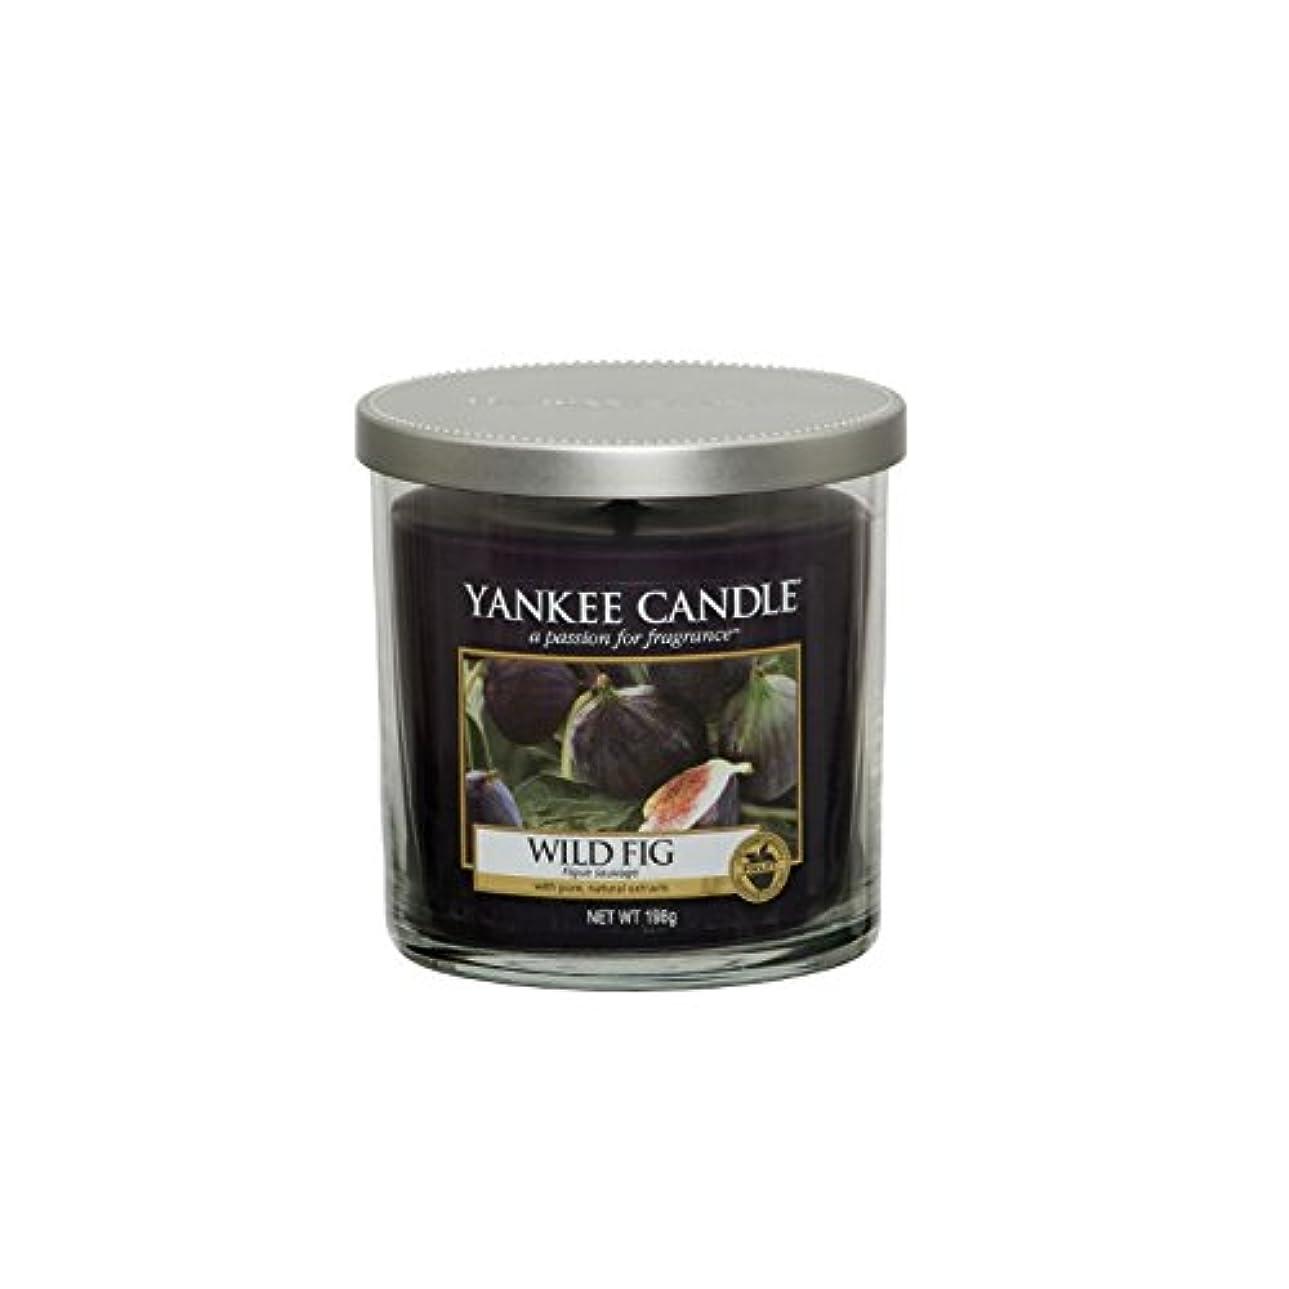 Yankee Candles Small Pillar Candle - Wild Fig (Pack of 2) - ヤンキーキャンドルの小さな柱キャンドル - 野生のイチジク (x2) [並行輸入品]